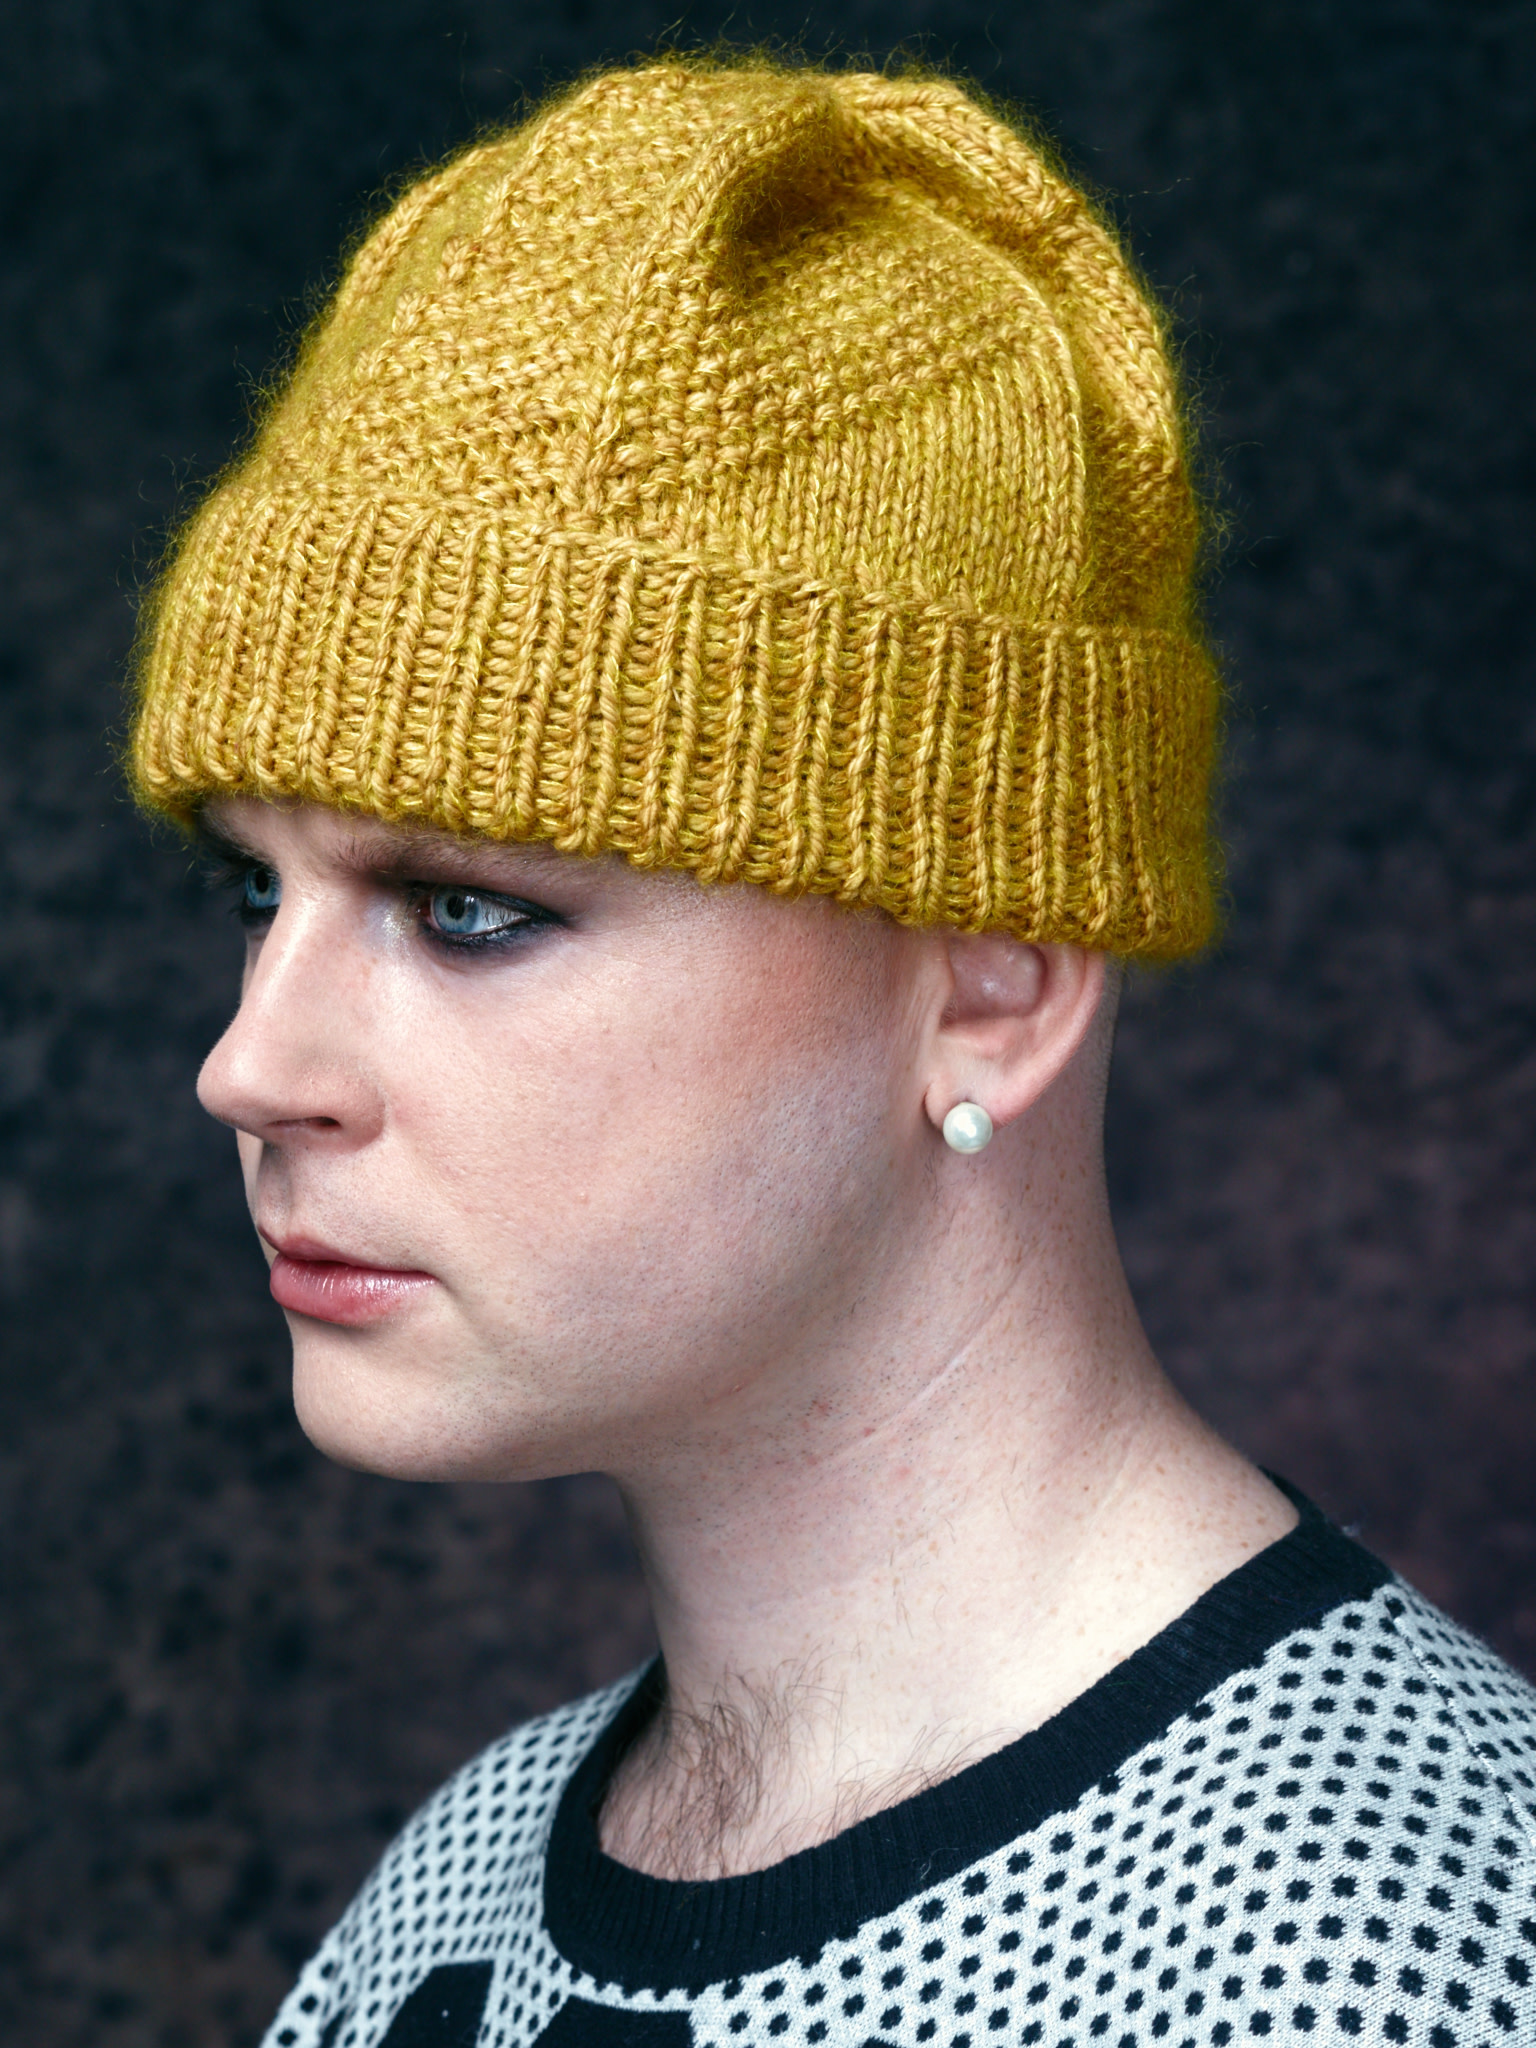 Westknits WK HIBERKNITTING HAT - KIT CANAL HOUSE